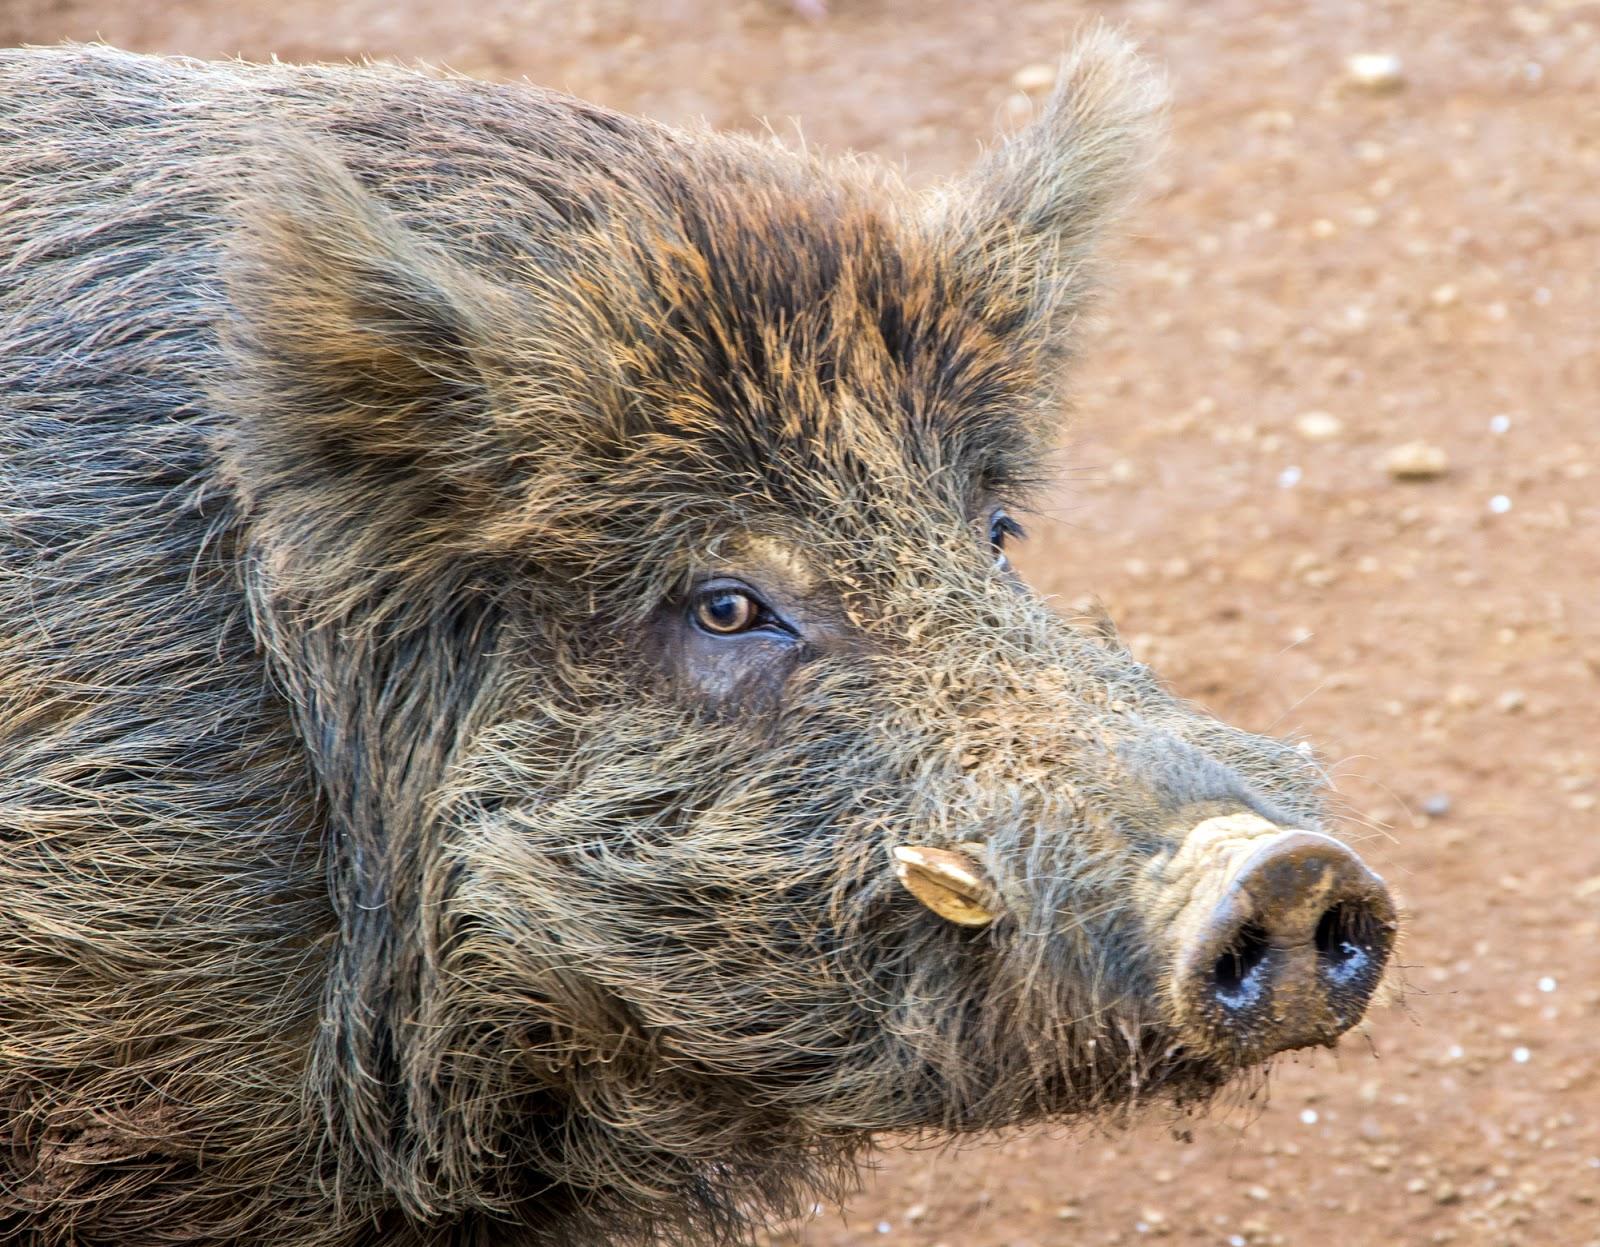 Hawaiian-wild-pig-wallpaper-wpc9005854